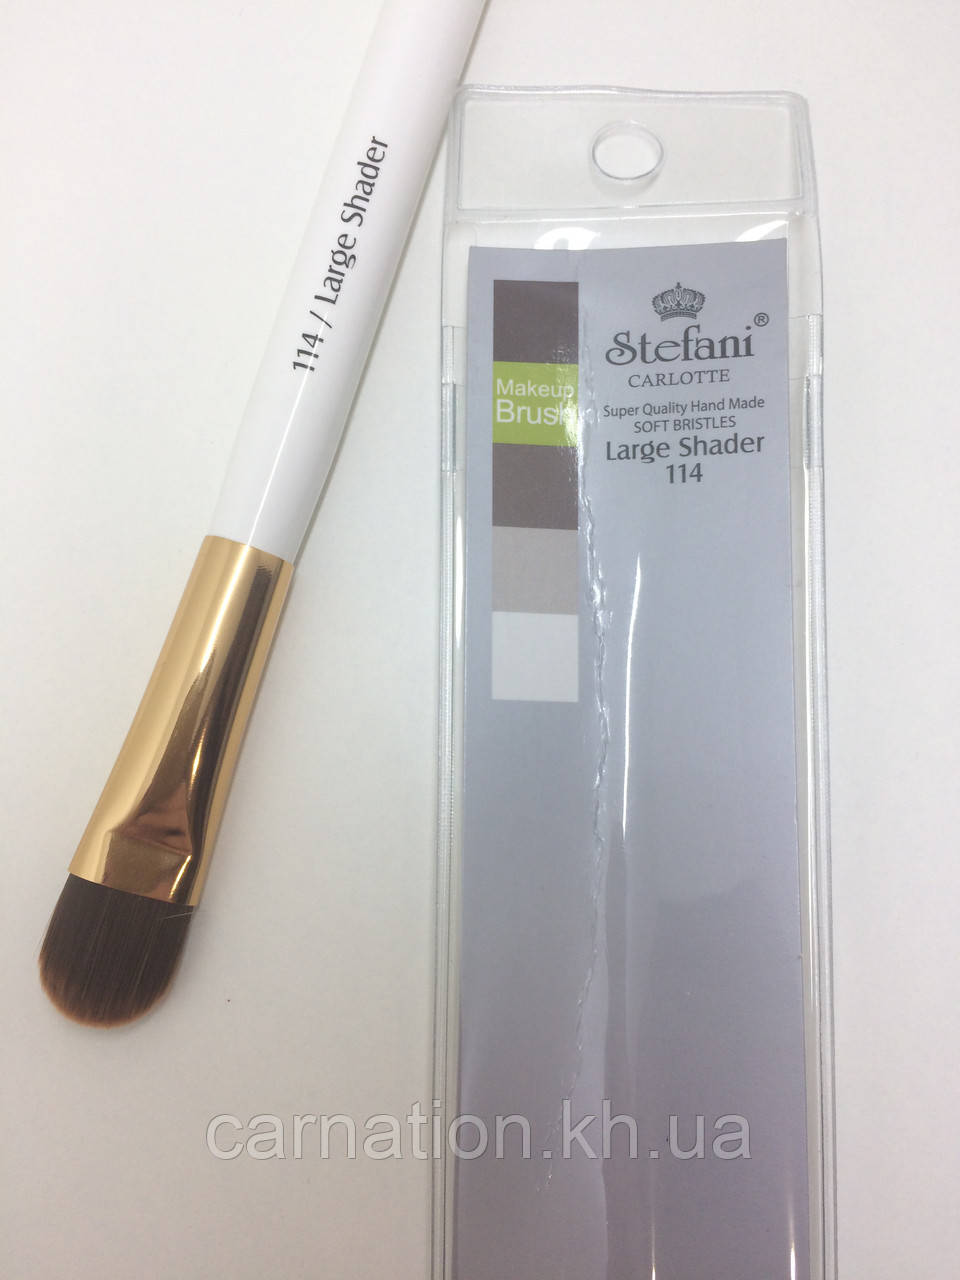 Кисть для теней Stefani Large Shader 114